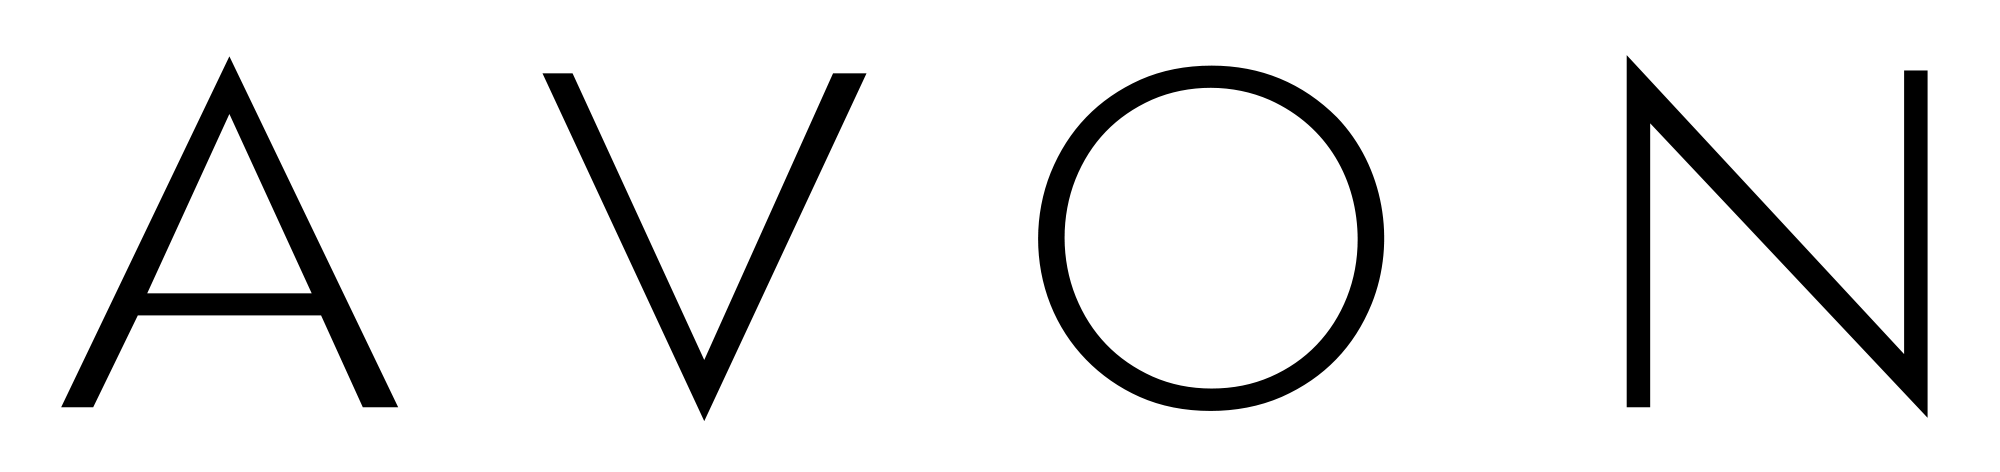 avon-logo-grande.png